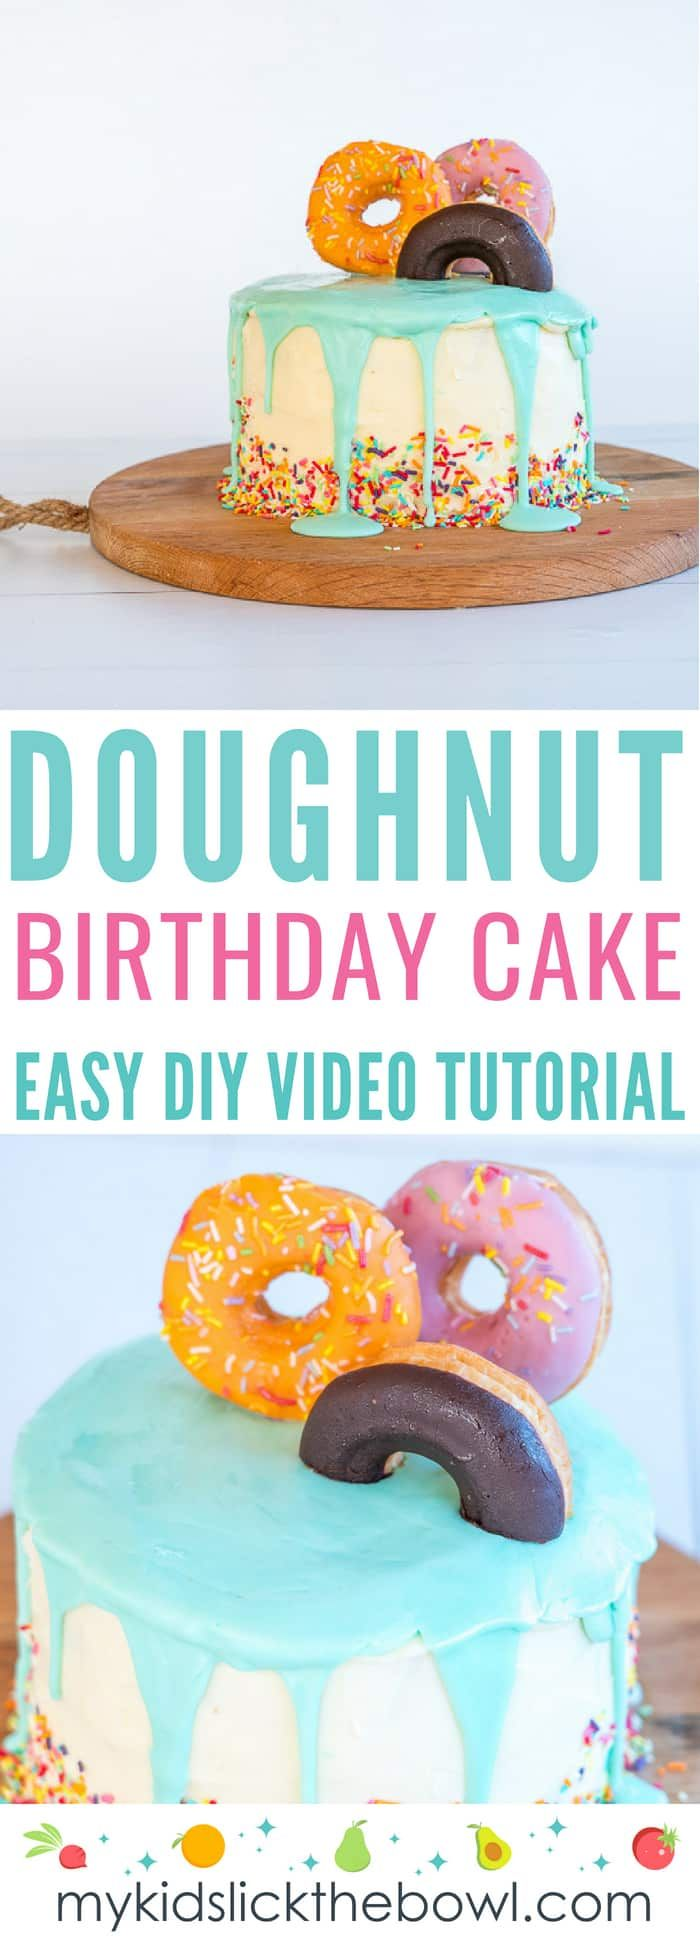 Easy DIY Birthday Cake Ideas for Children- video tutorials